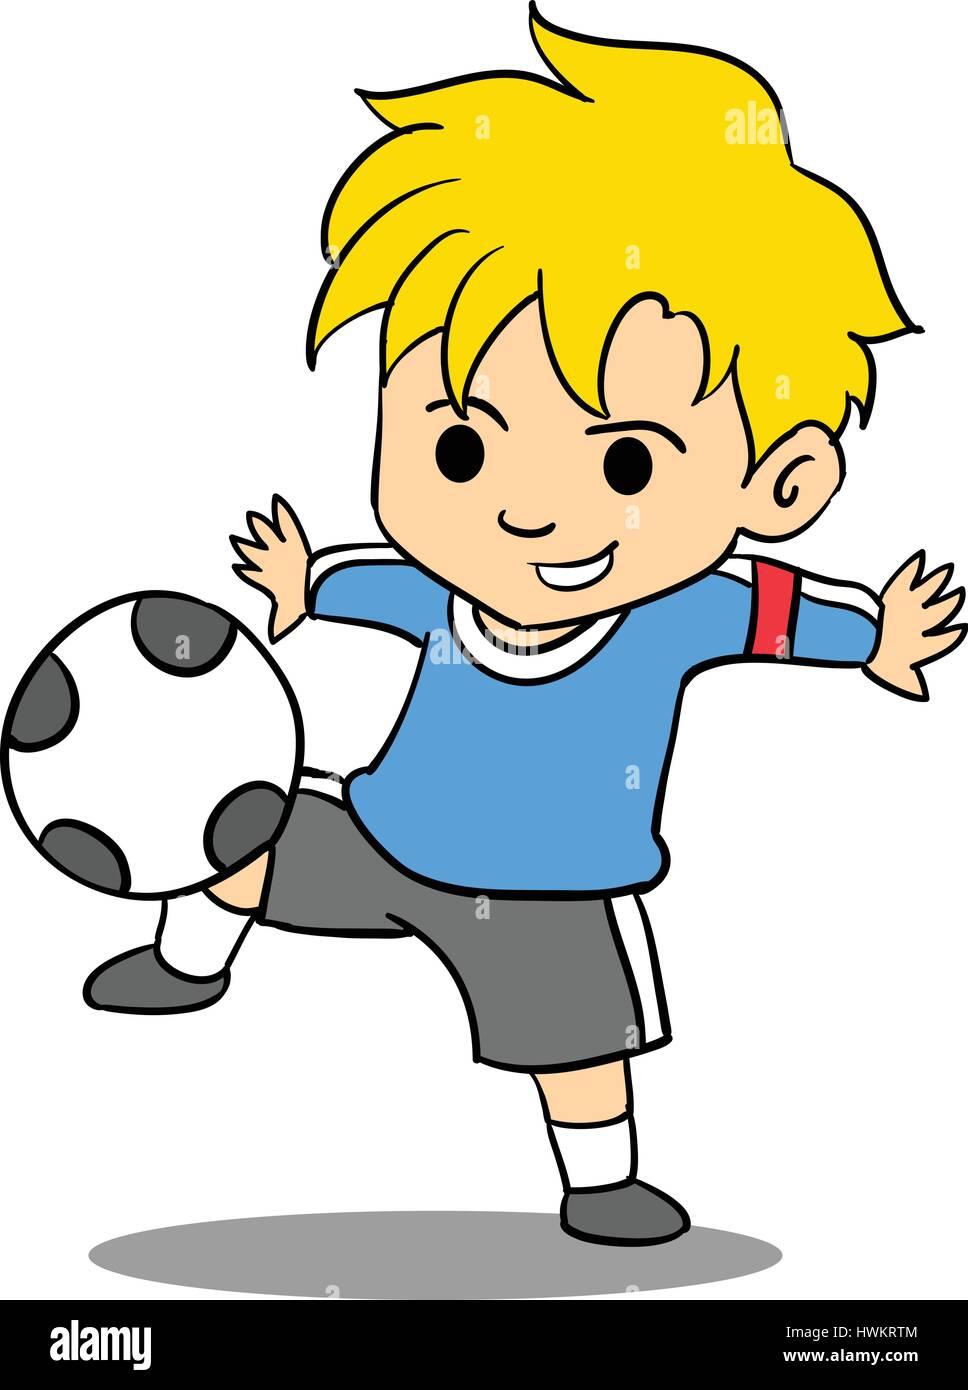 Kid Playing Football Of Character Stock Vector Art